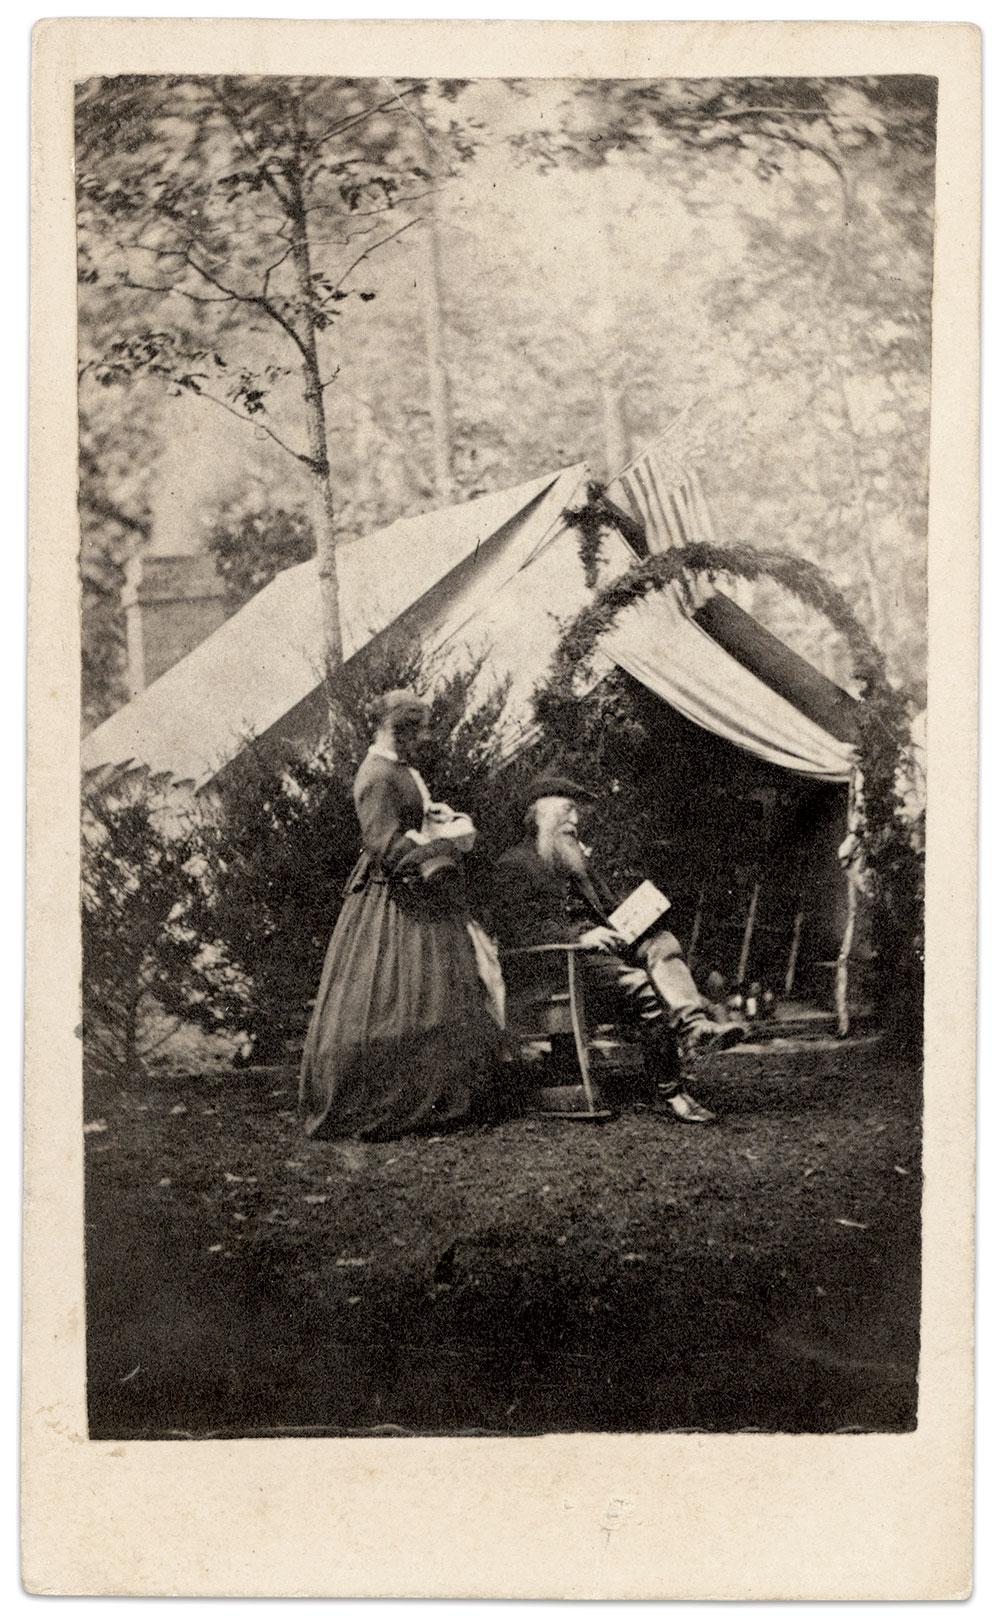 Carte de visite by P.S. Weaver of Hanover, Pa. Ronald S. Coddington Collection.